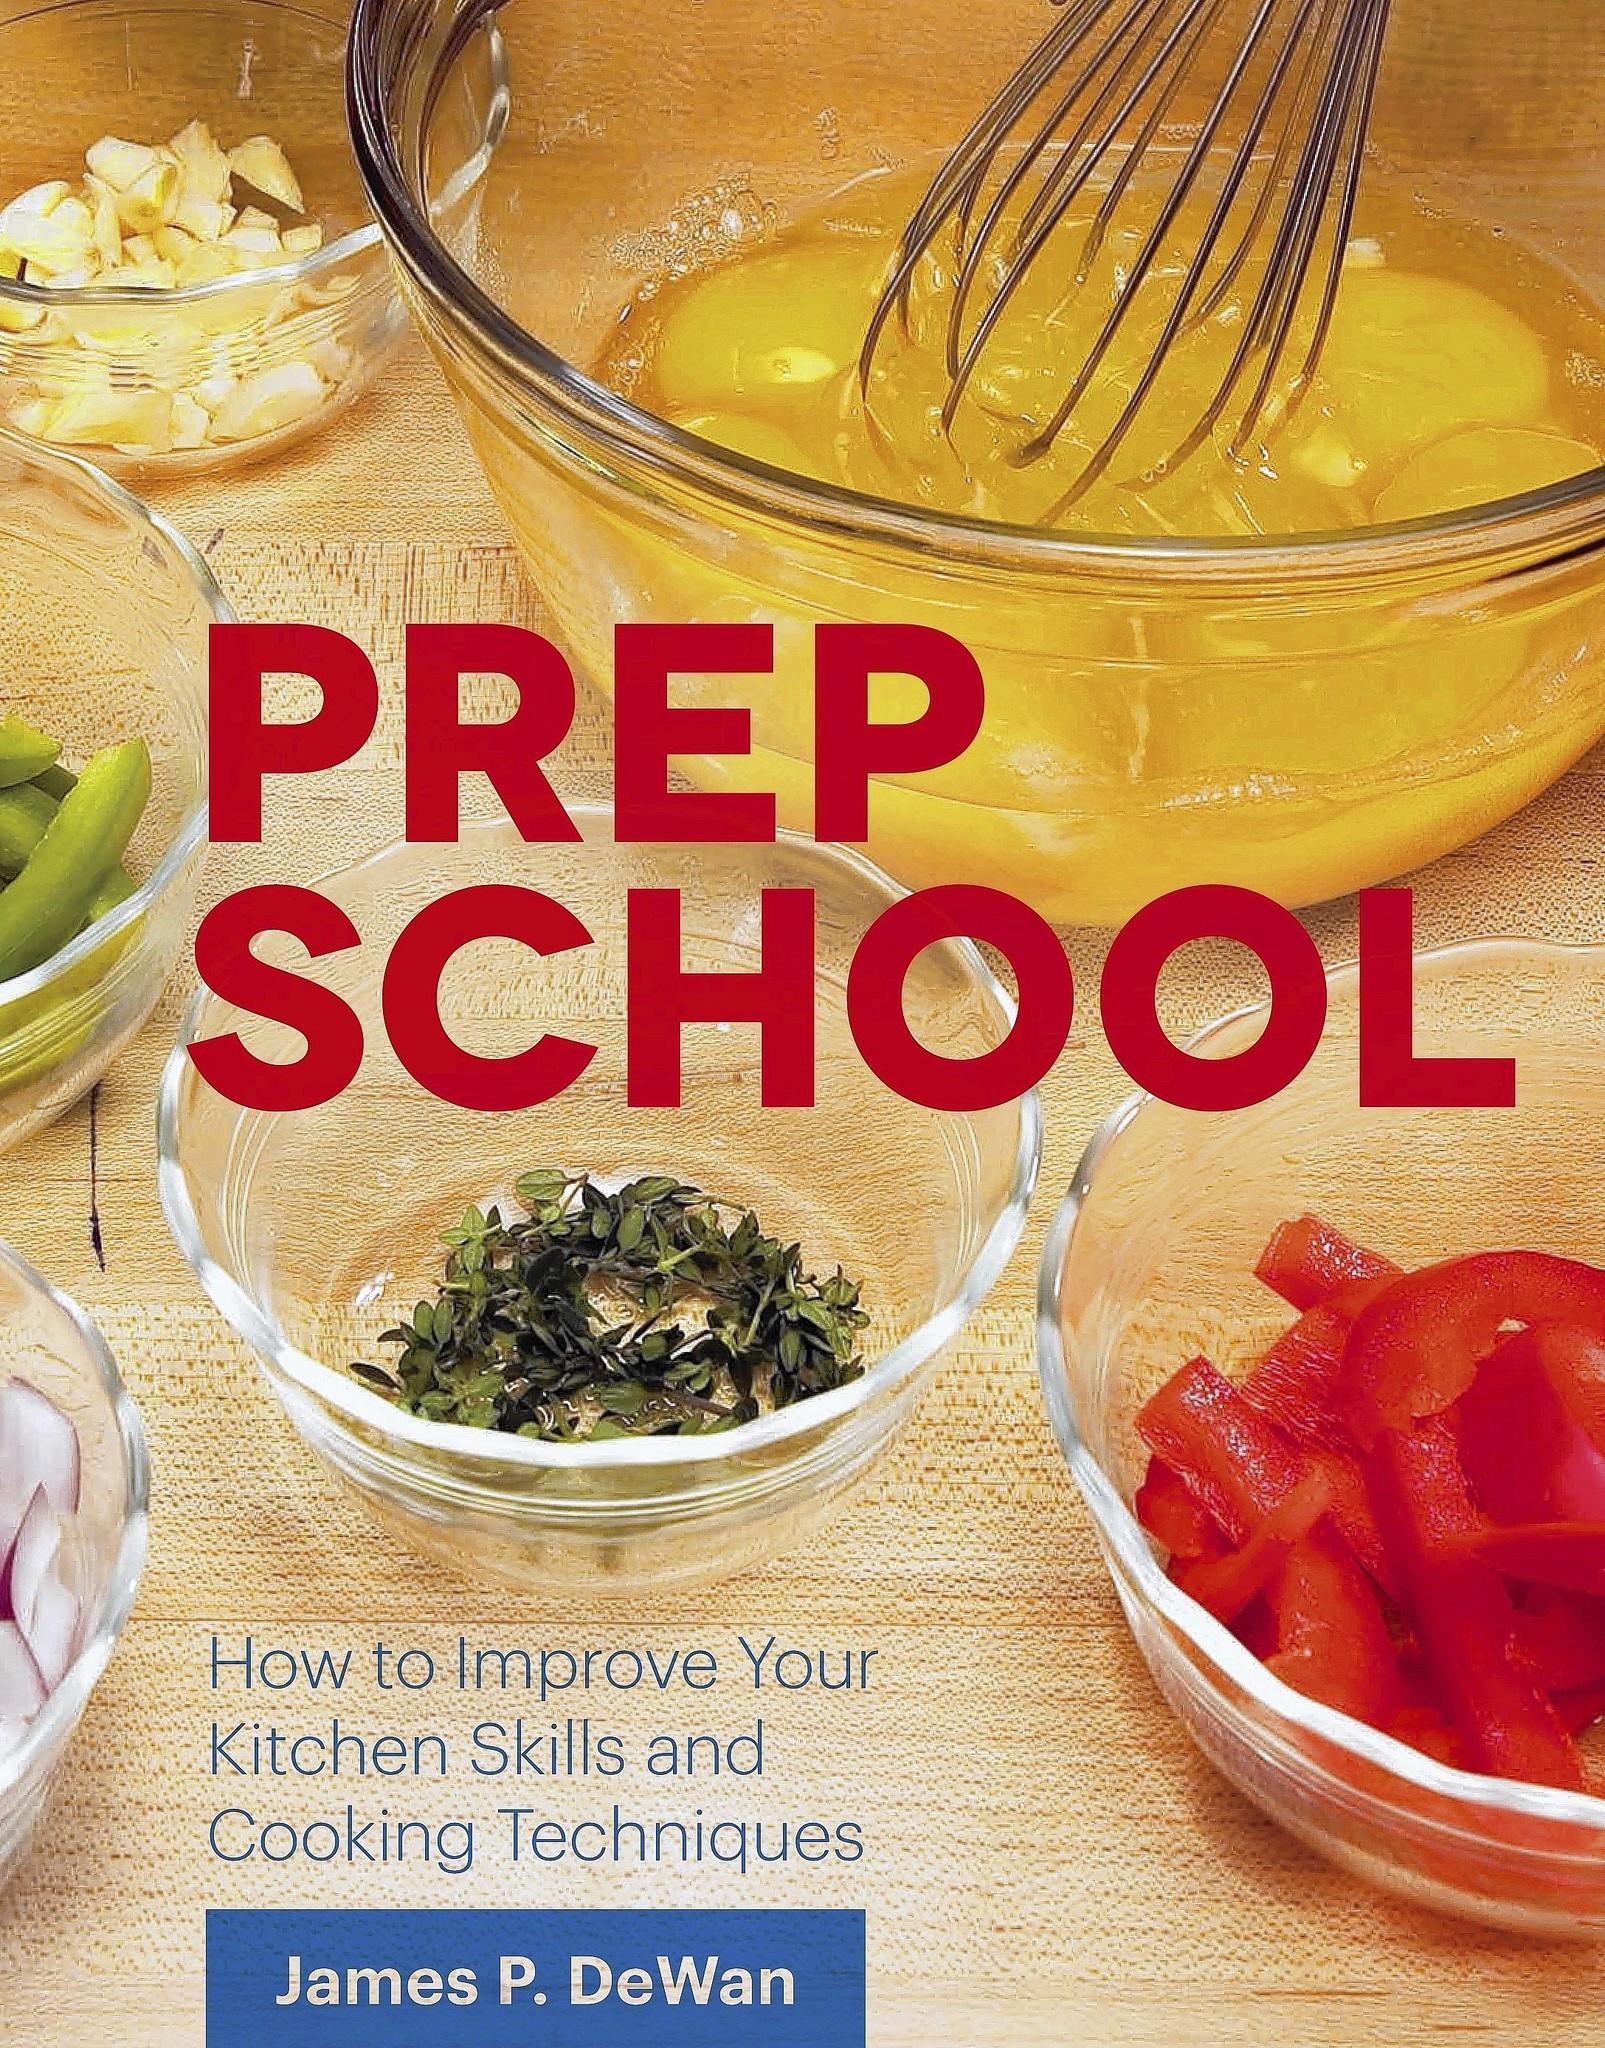 Prep School by James P. DeWan.